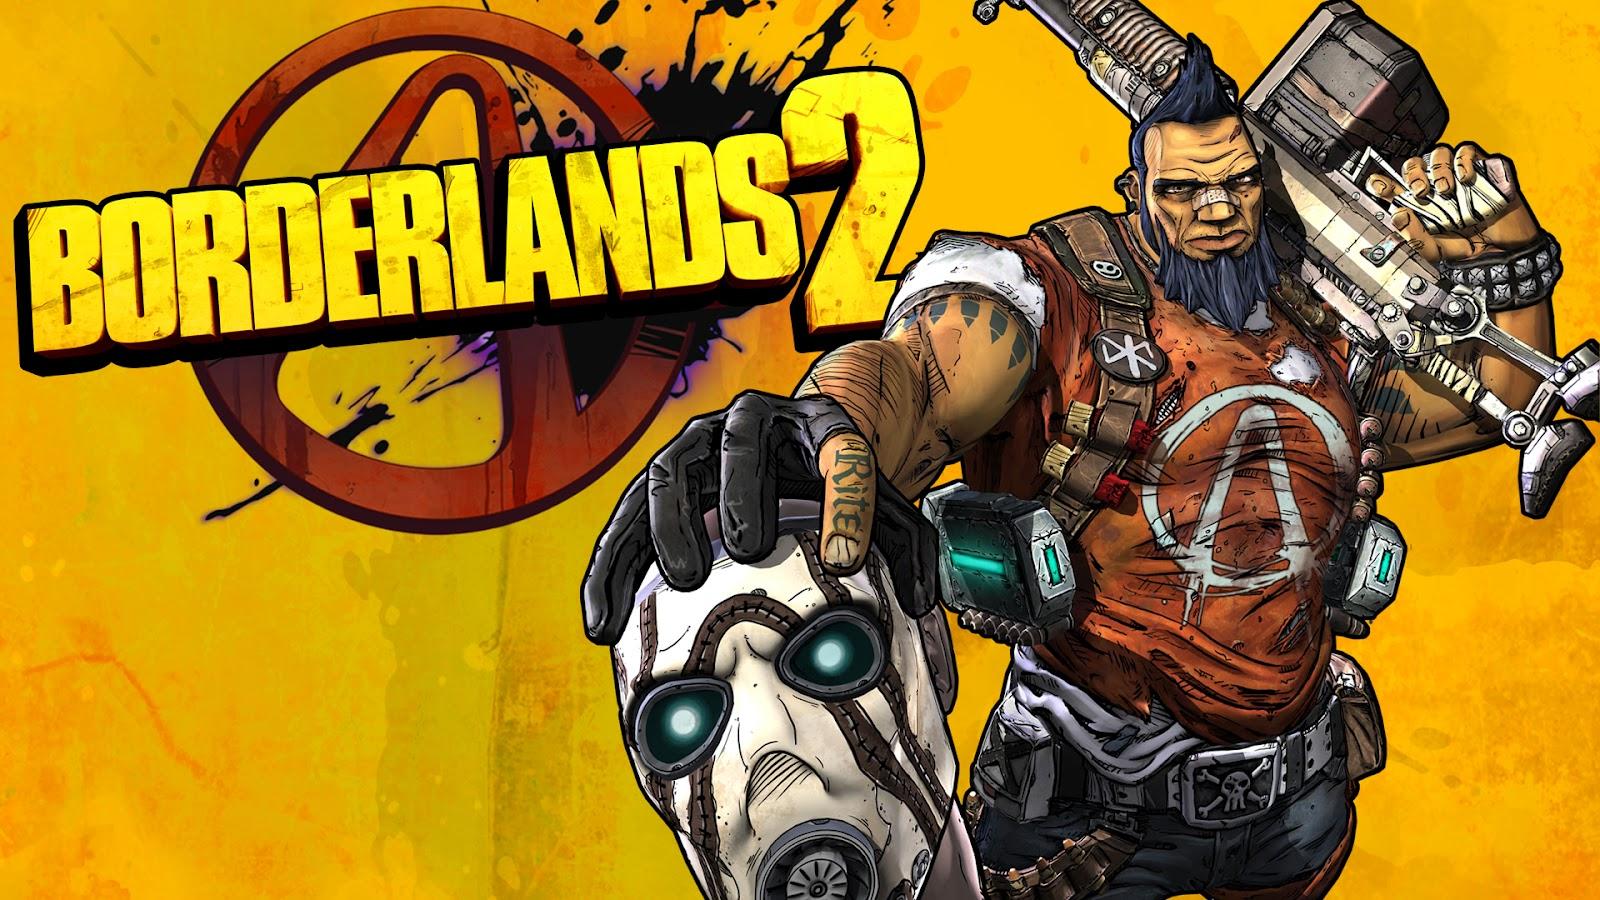 Borderlands 2 PC News | PCGamesN